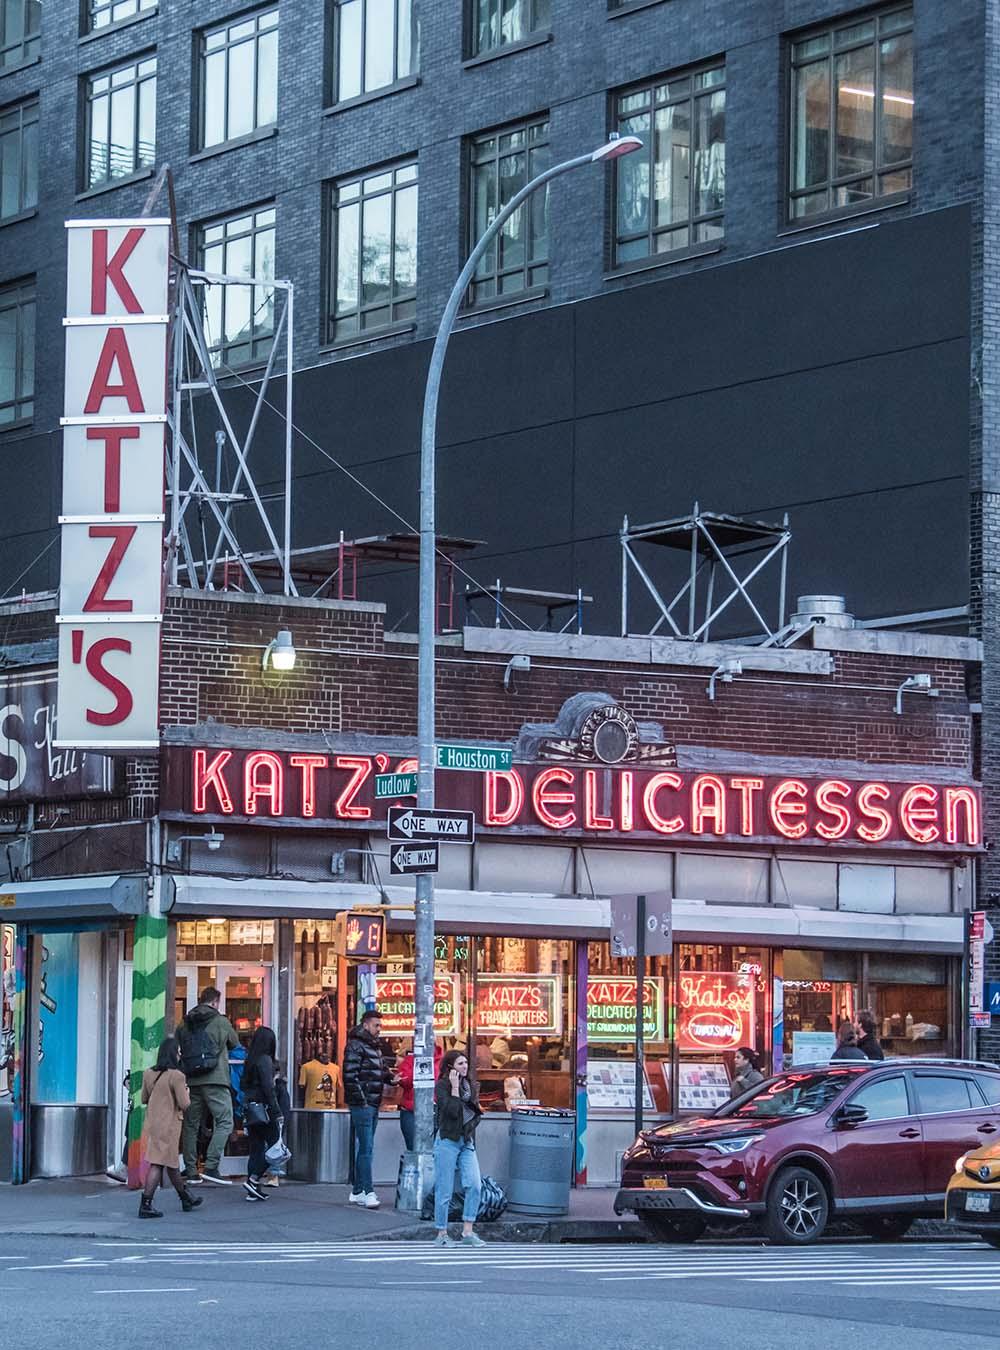 Katz's Delikatessen